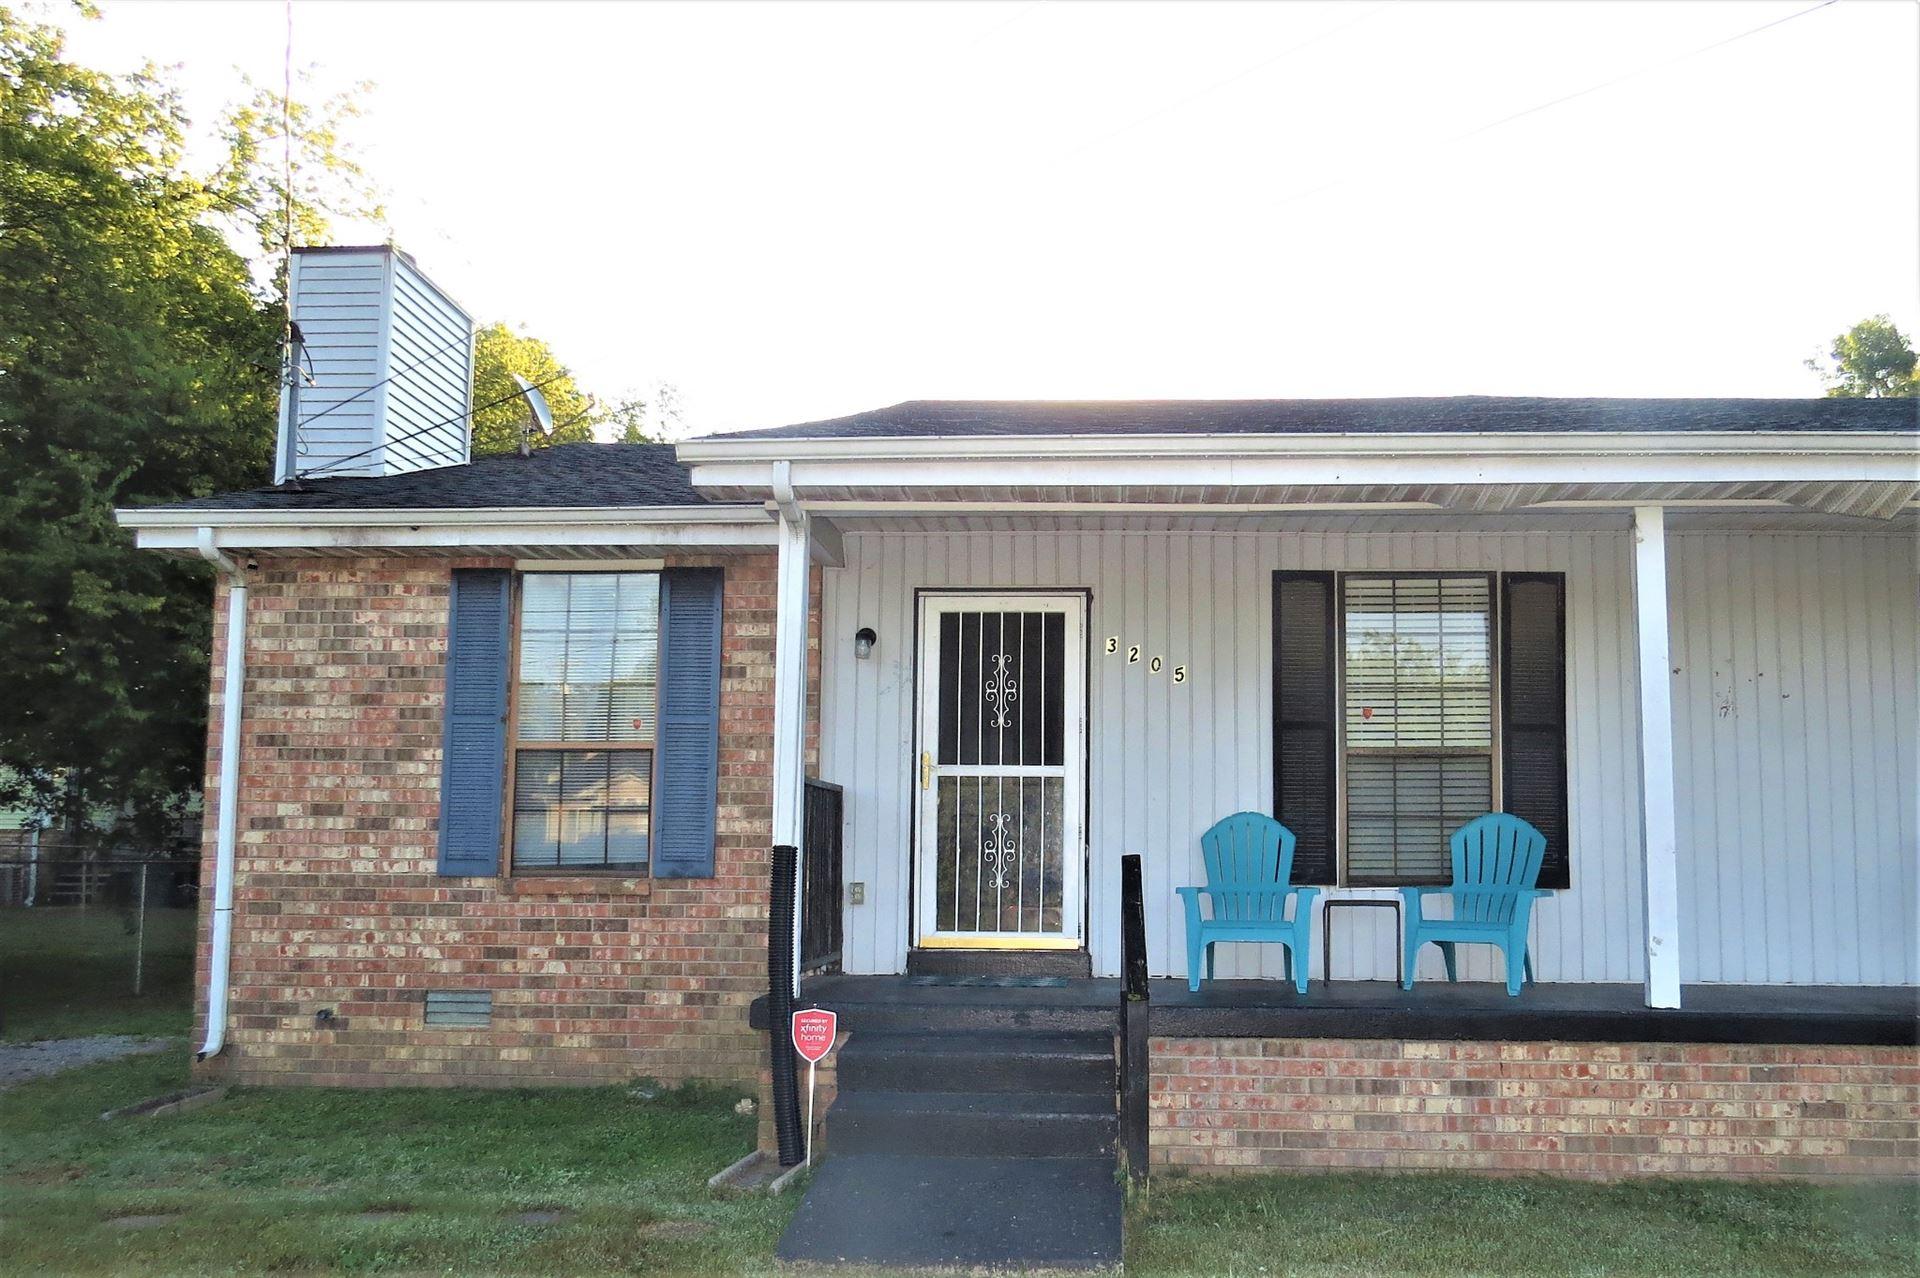 3205 Woodstock Dr, Nashville, TN 37207 - MLS#: 2201128